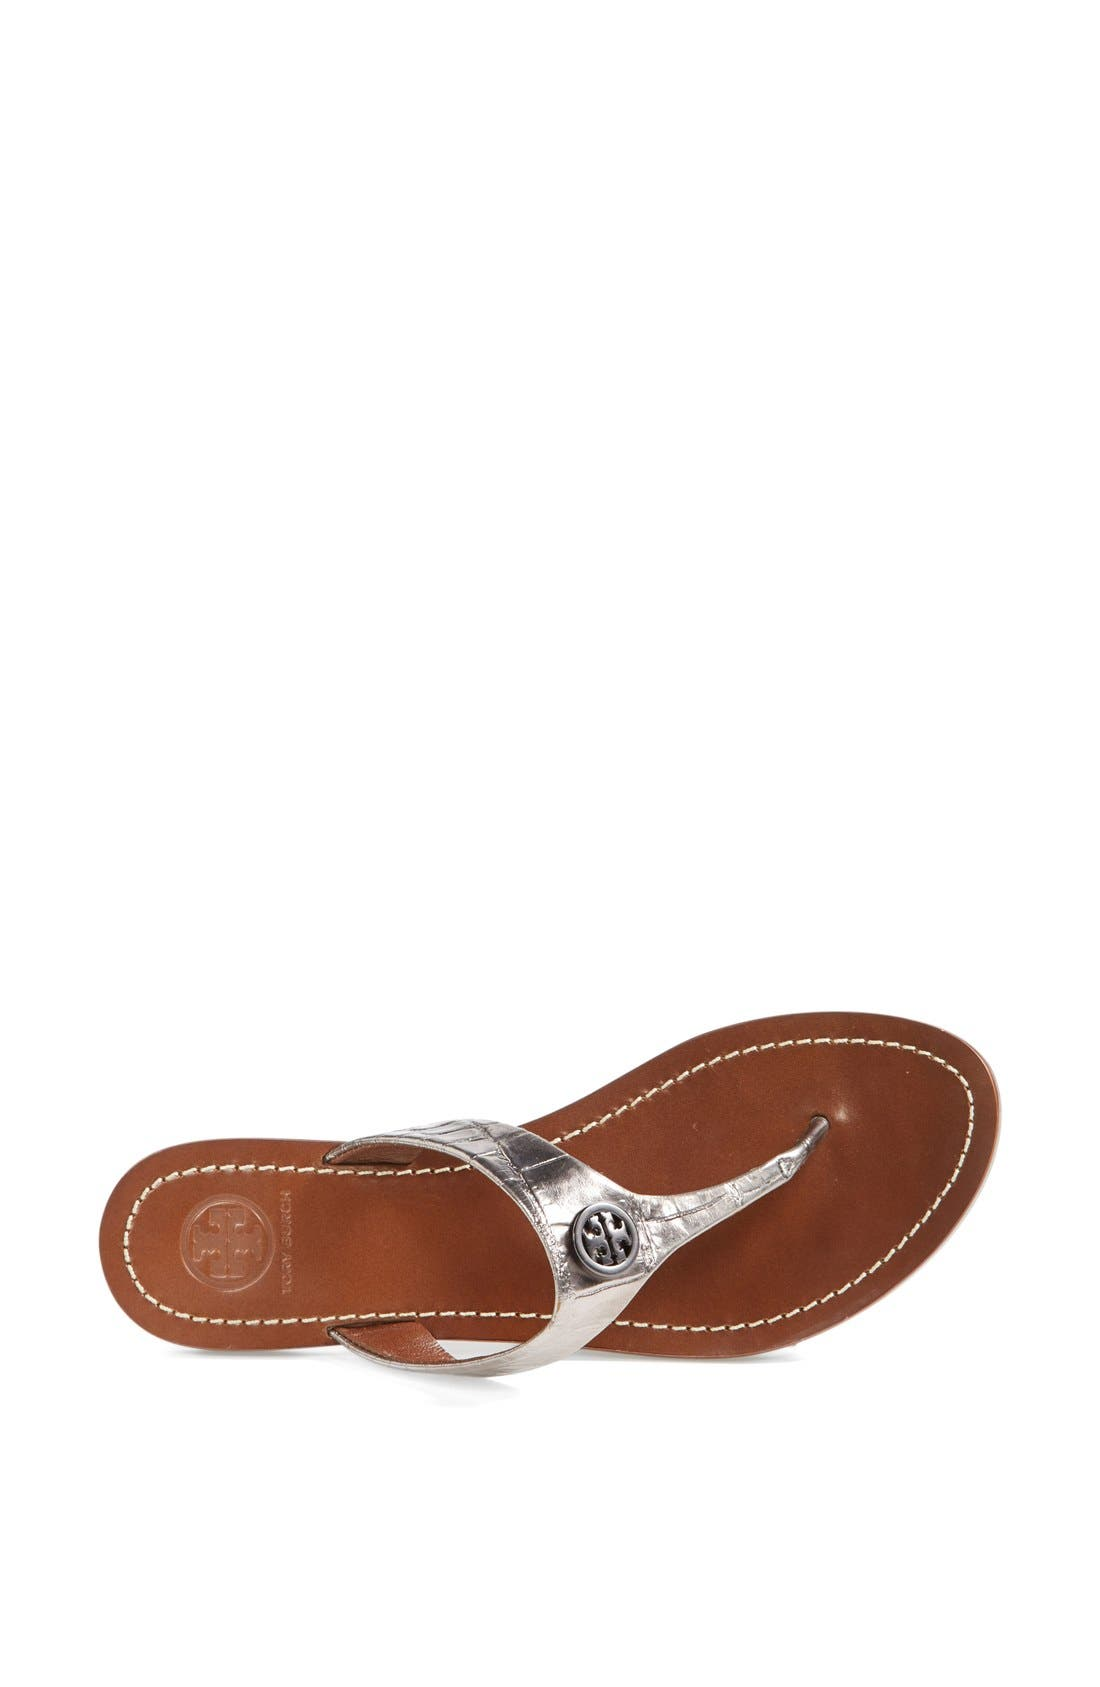 Alternate Image 3  - Tory Burch 'Cameron' Sandal